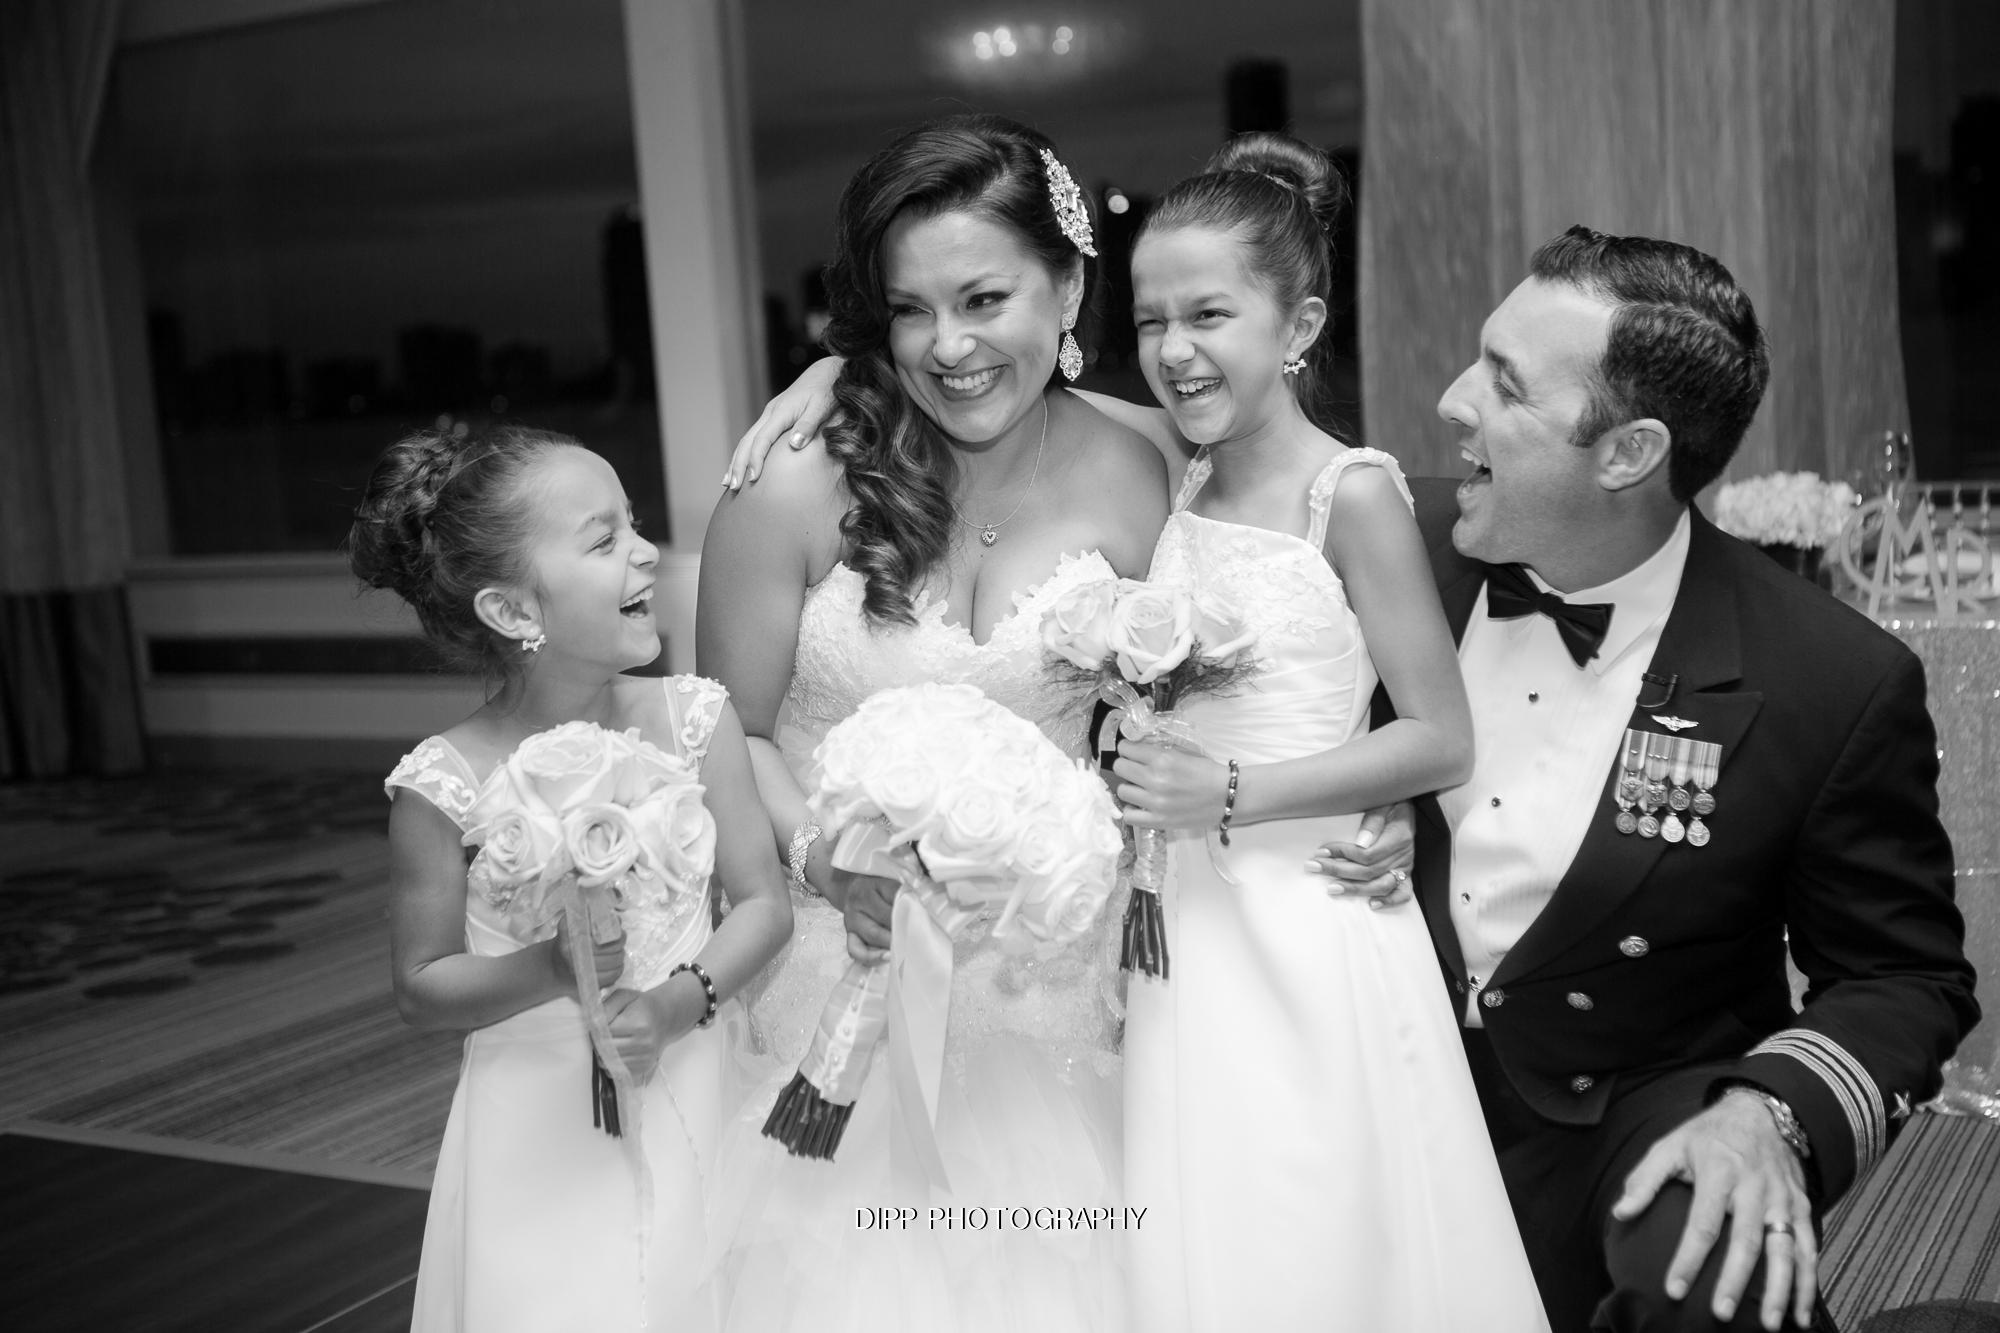 Dipp_2016 EDITED Sara & Brandon Wedding-356